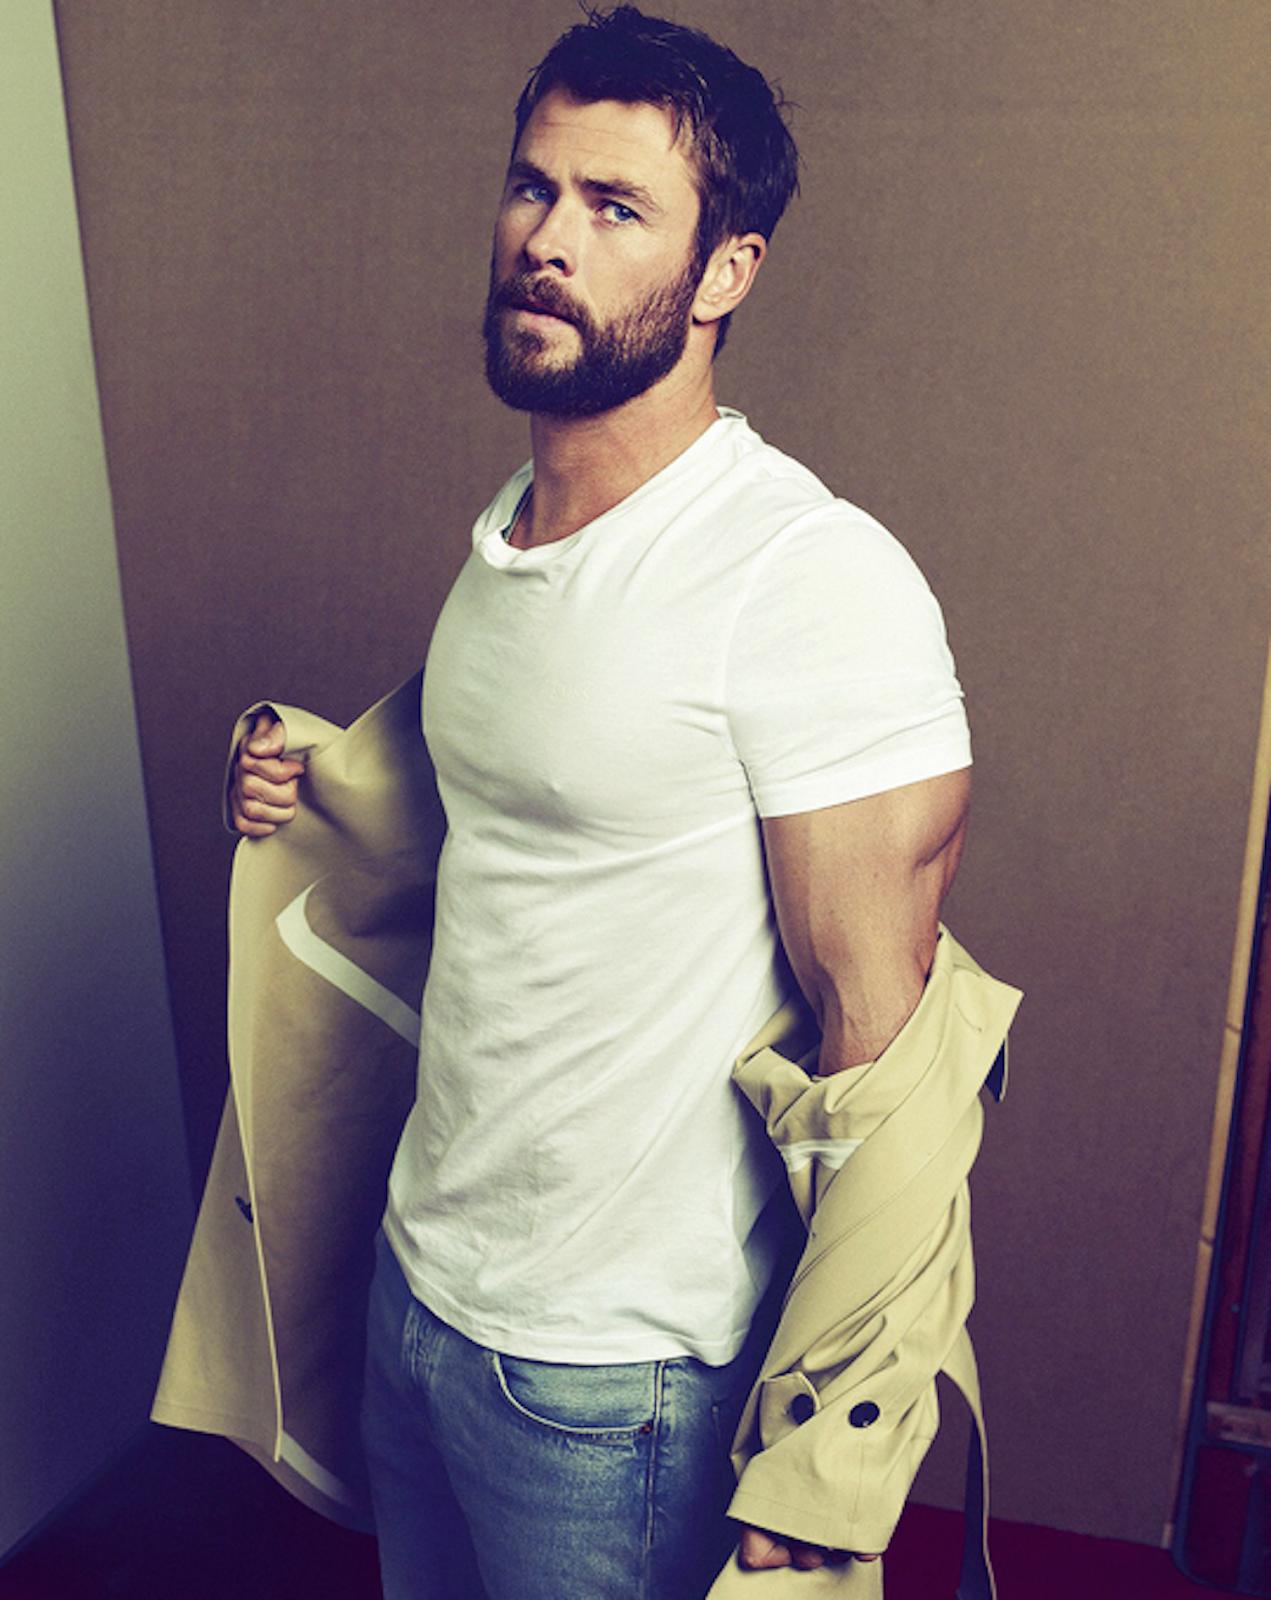 Chris Hemsworth 2 Png 1 271 1 600 Pixels Chris Hemsworth Thor Chris Hemsworth Hemsworth